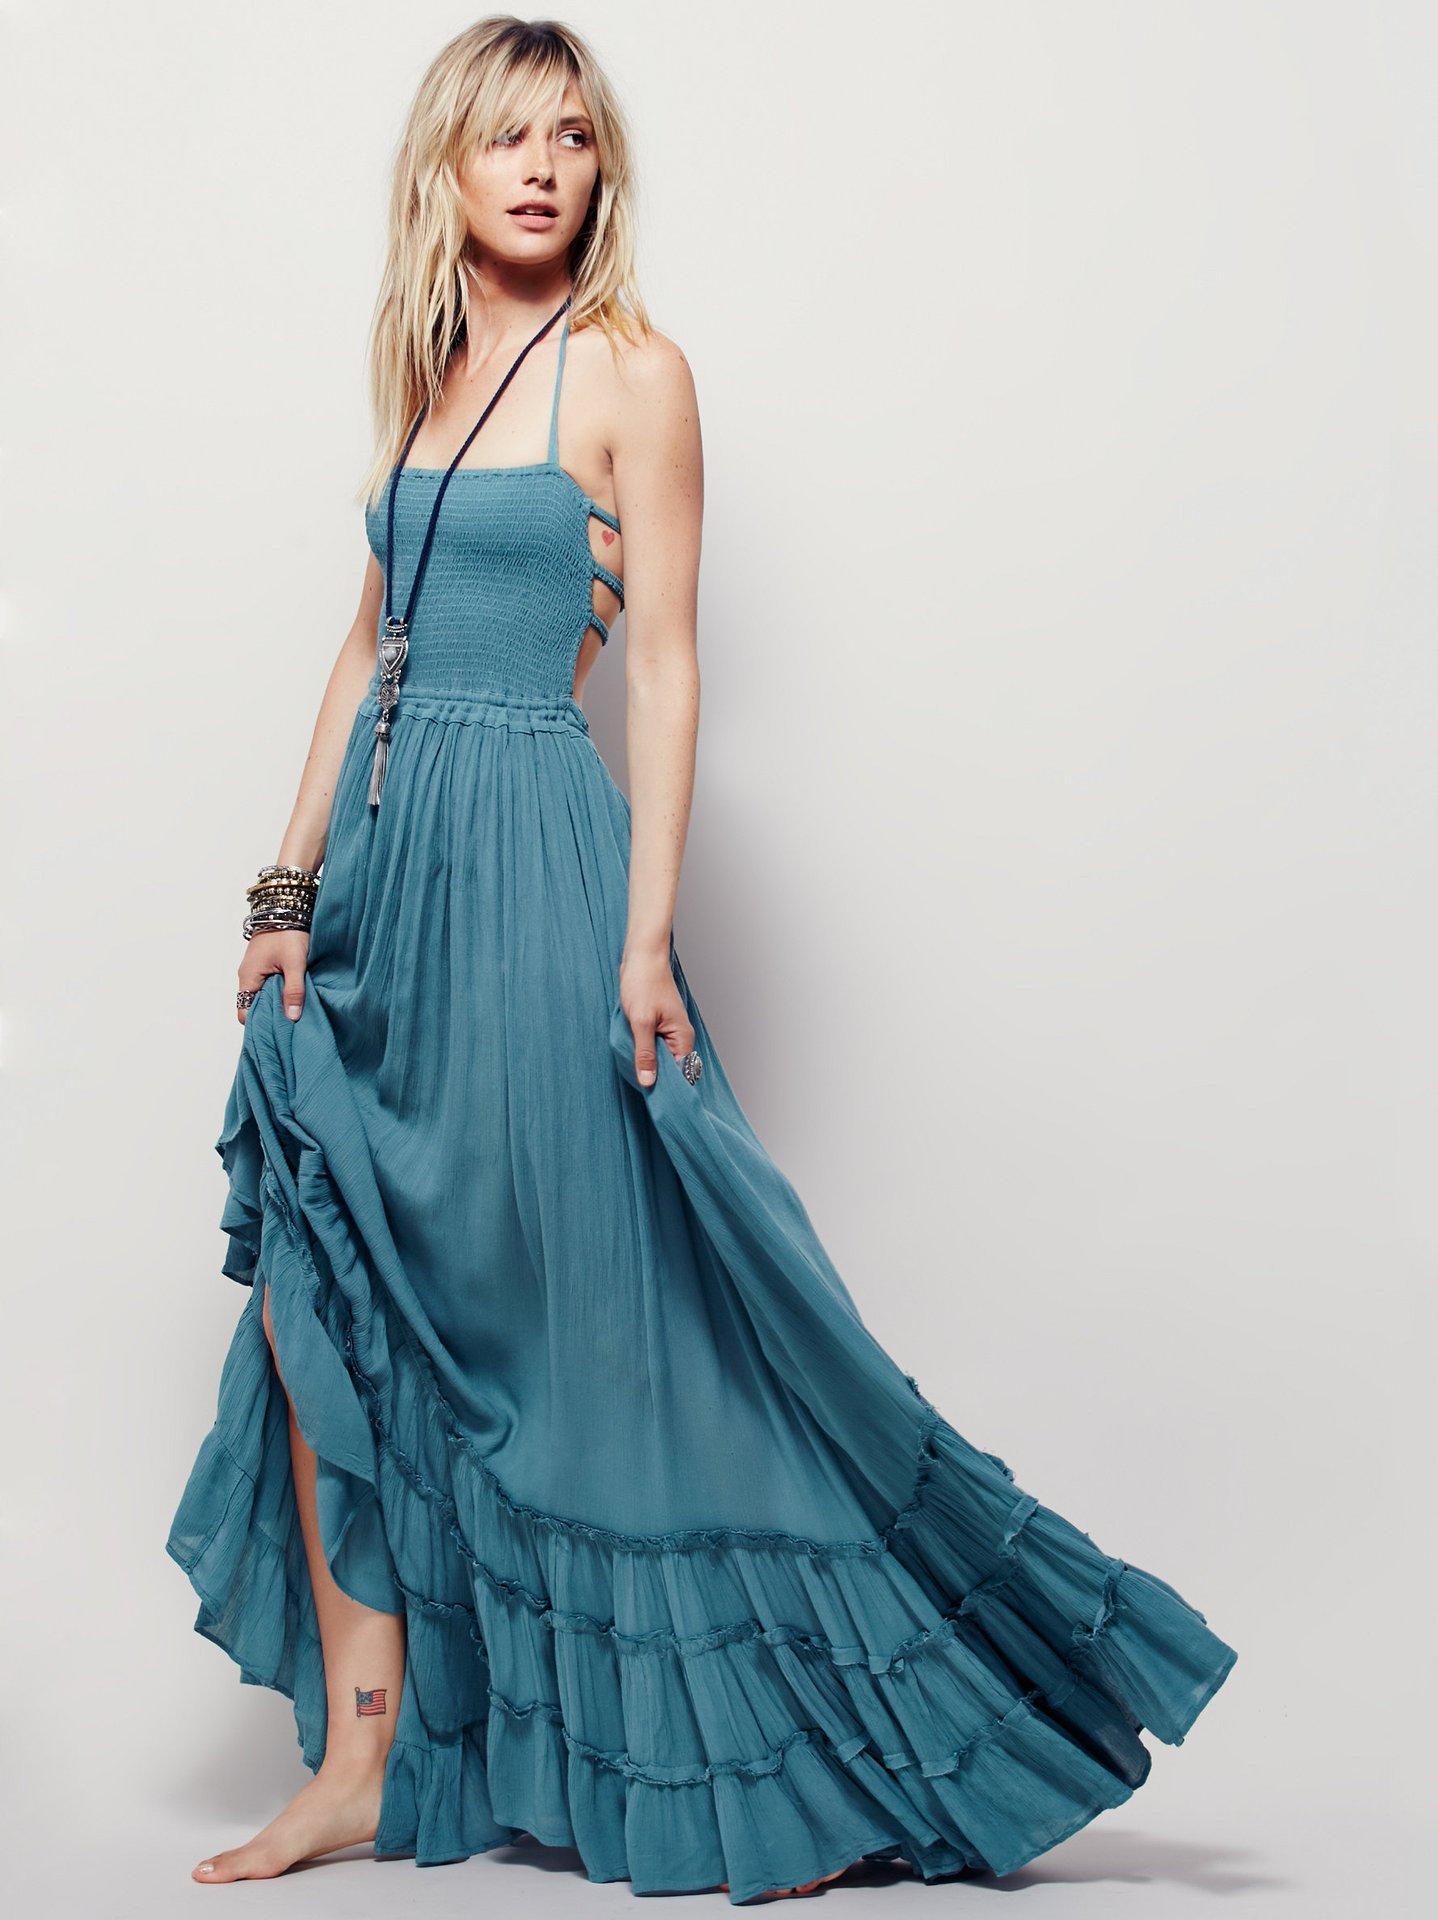 Amara Boho Dress | Boho, Comfy and Bohemian